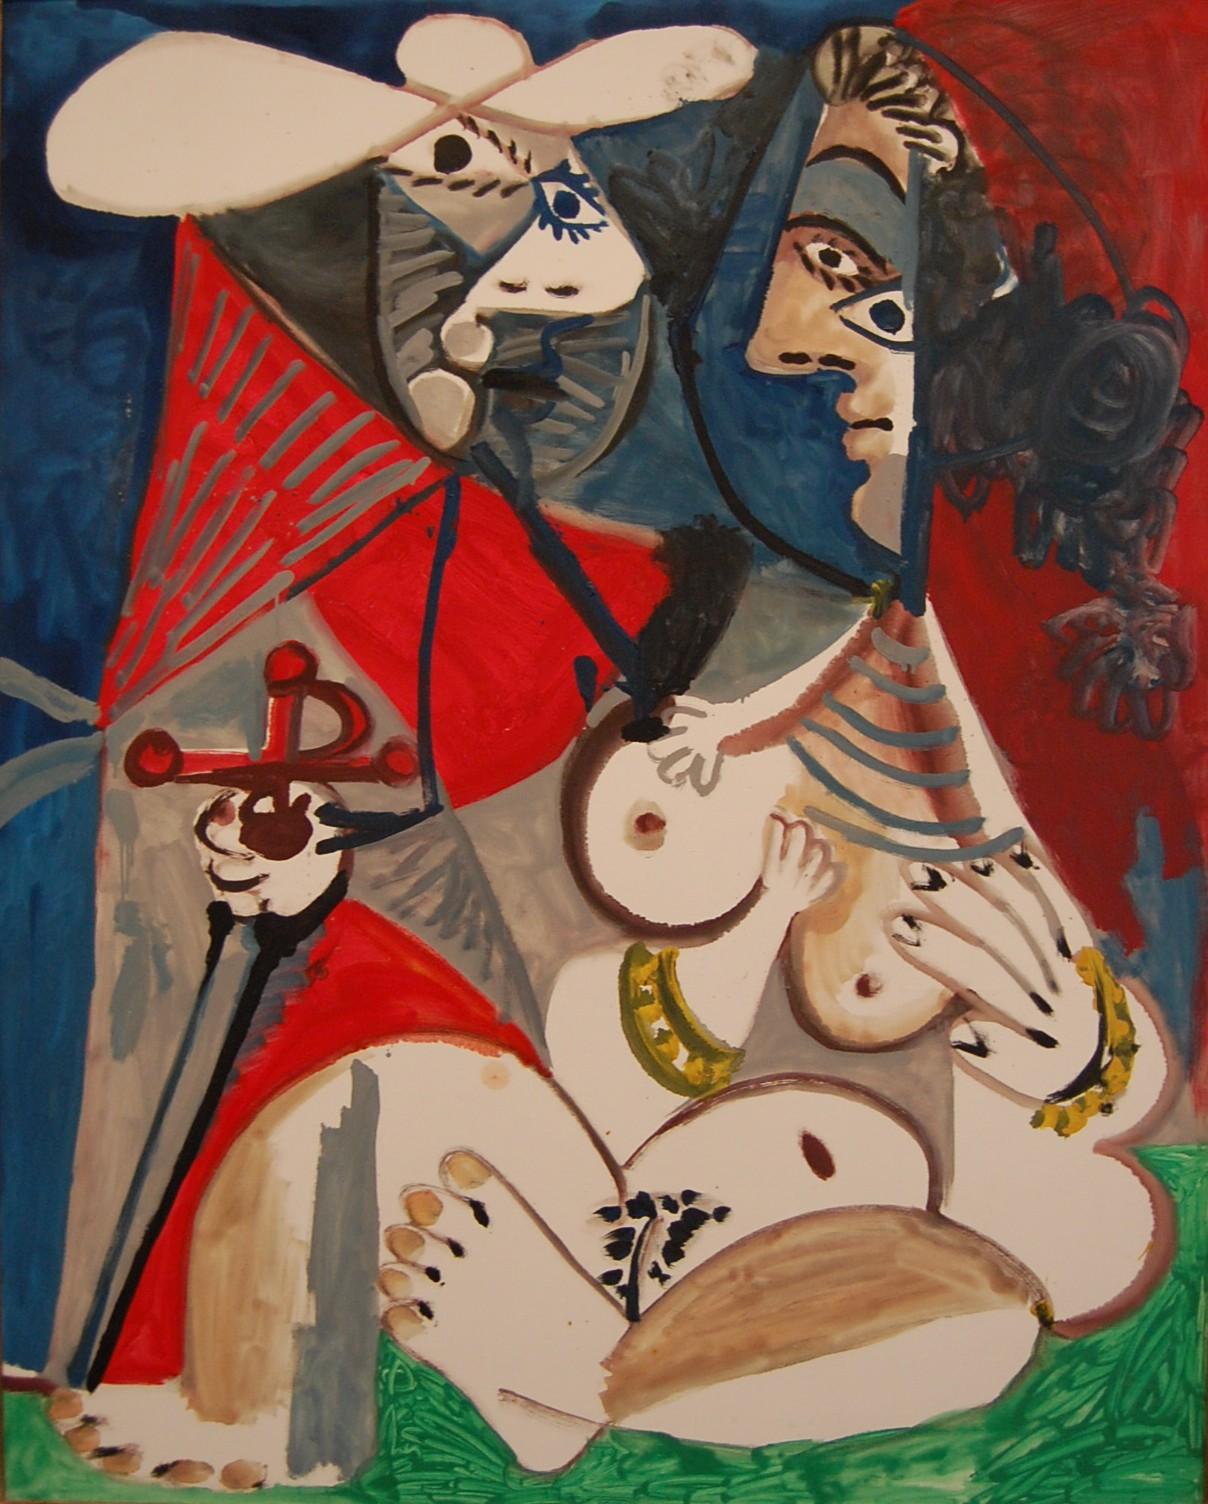 Picasso-Matador-et-femme-nue-1970-Mus-e-Berggruen-Berlin.jpg